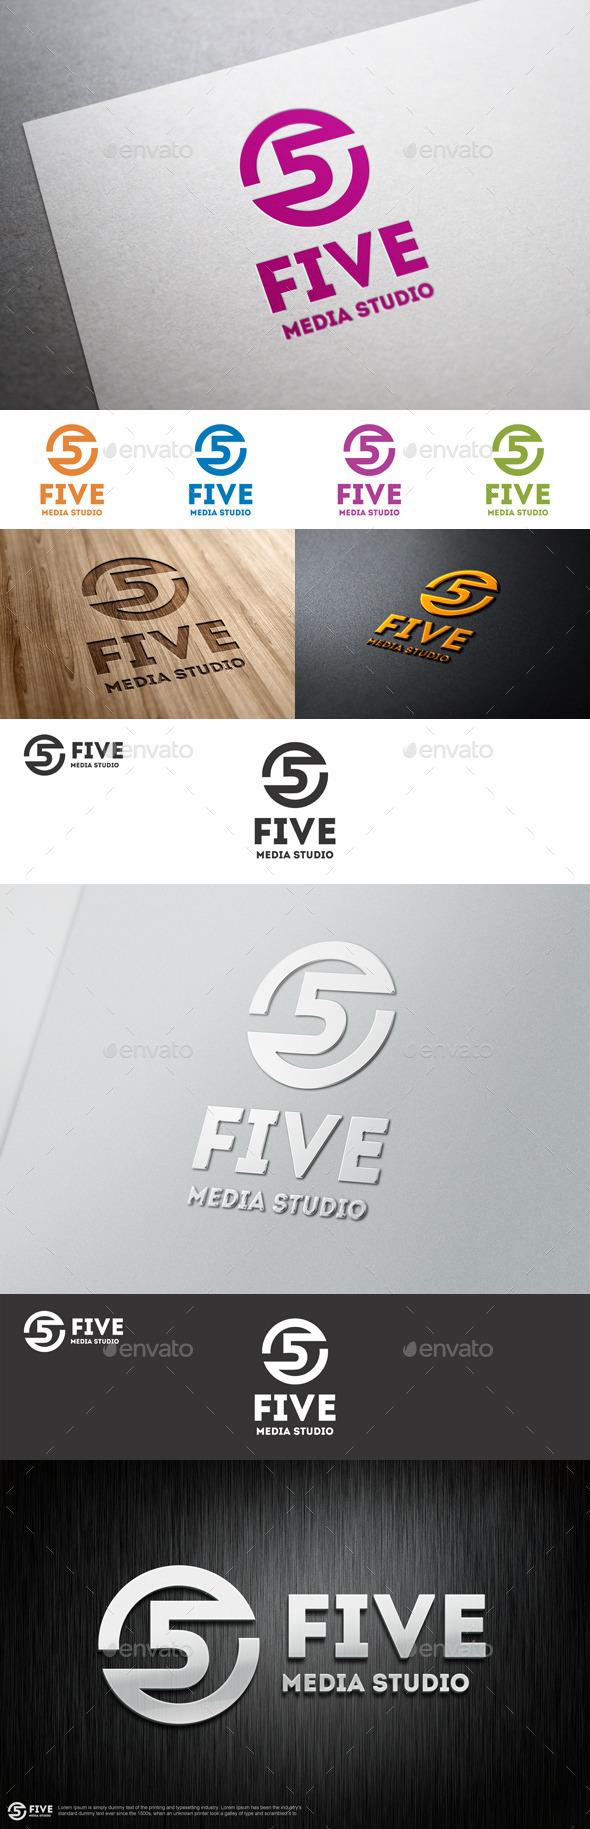 Five Media Studio Logo Template